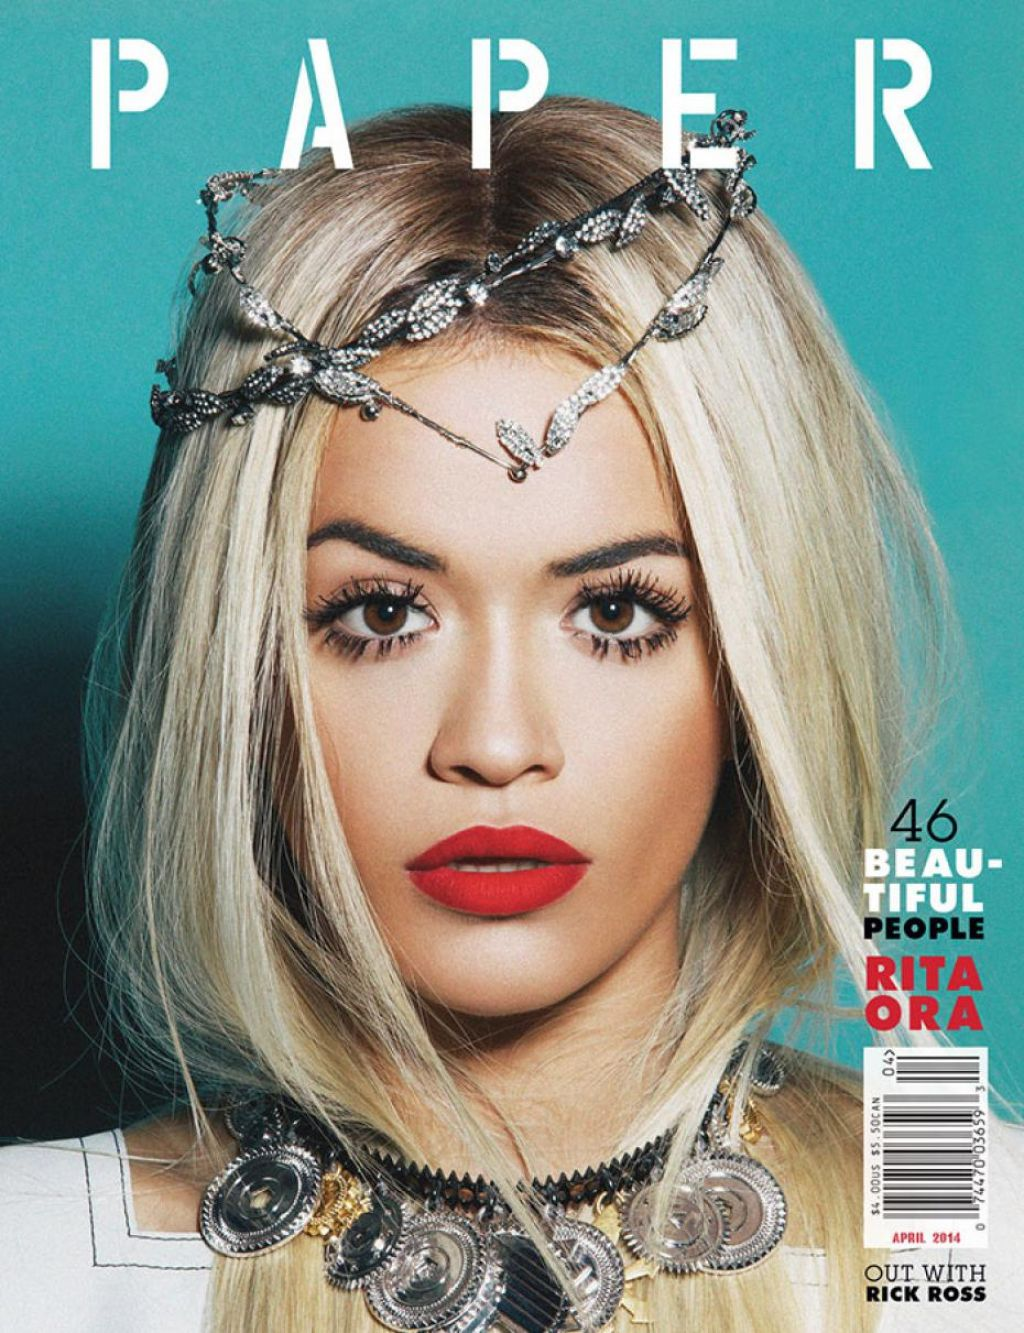 Introducing Our Winter Cover Star: Kim Kardashian